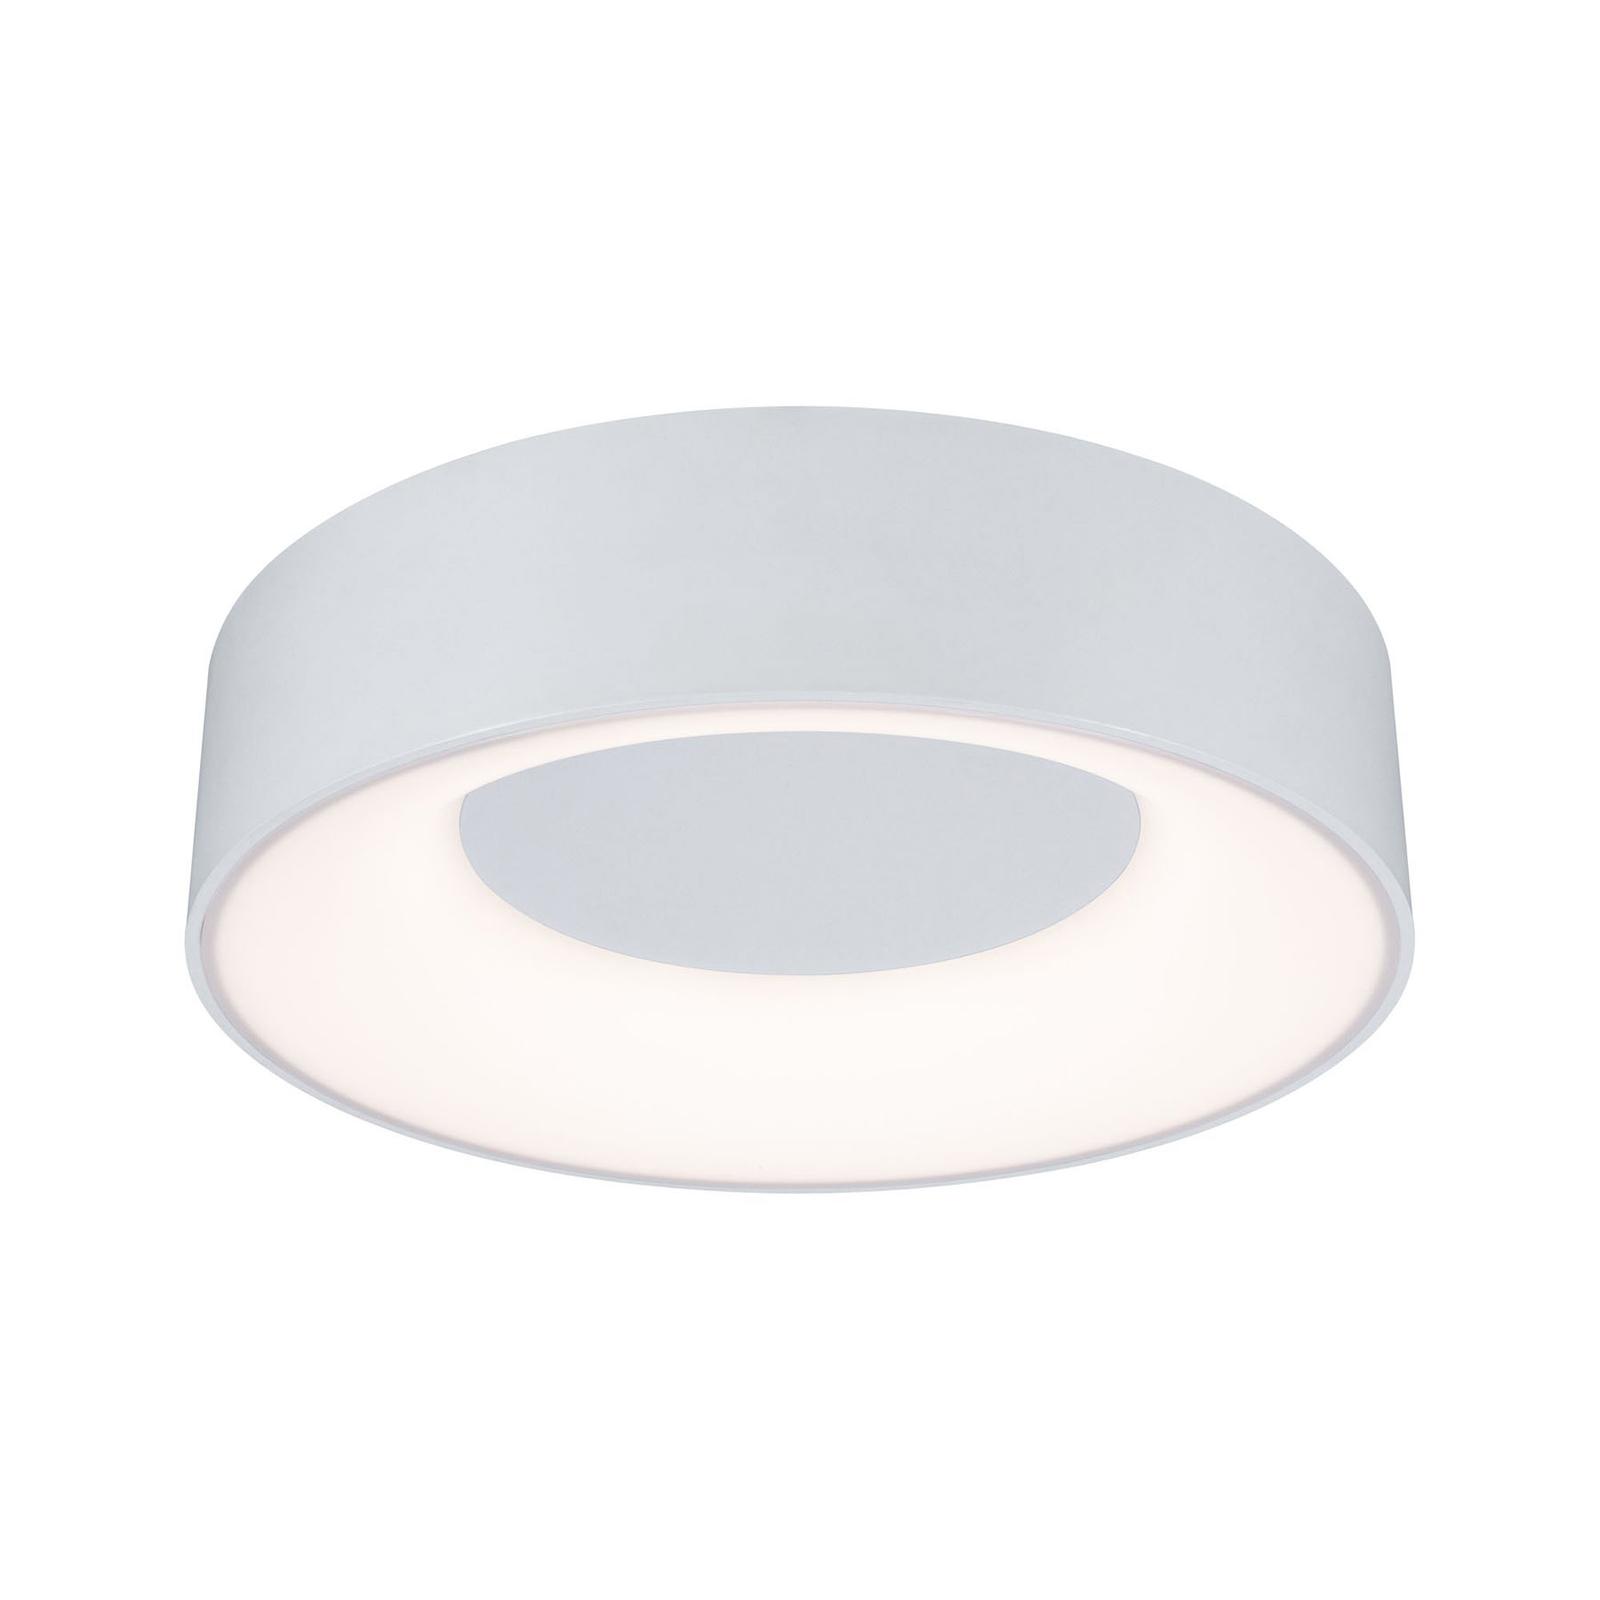 Paulmann HomeSpa Casca plafoniera LED, Ø 30 cm